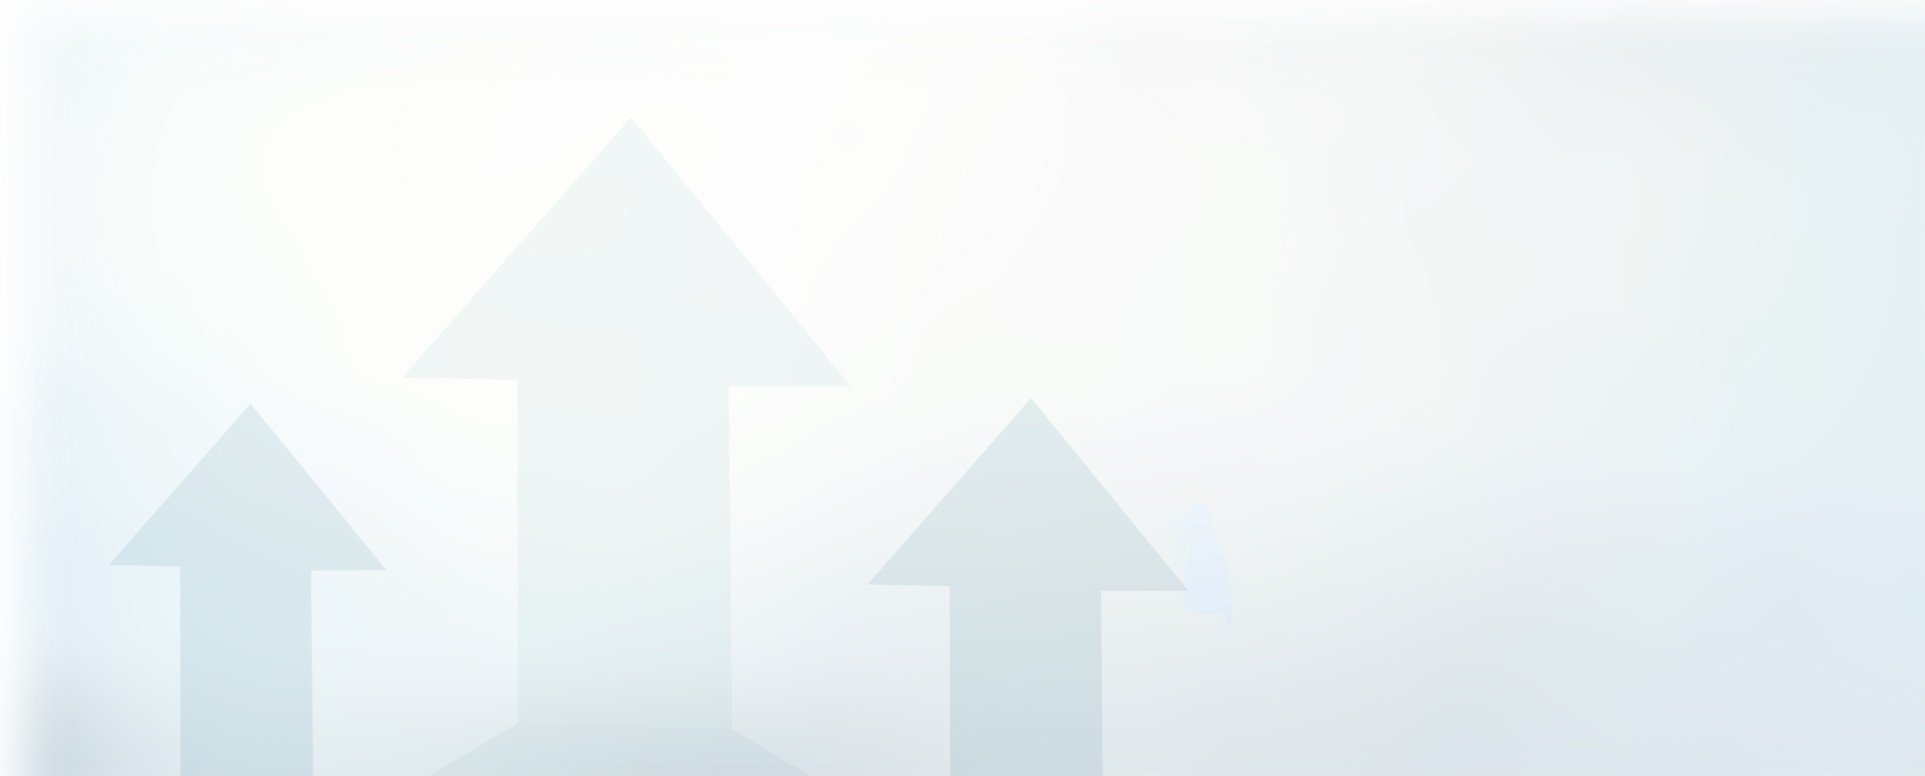 Hintergrund Webinar Headergrafik.jpg